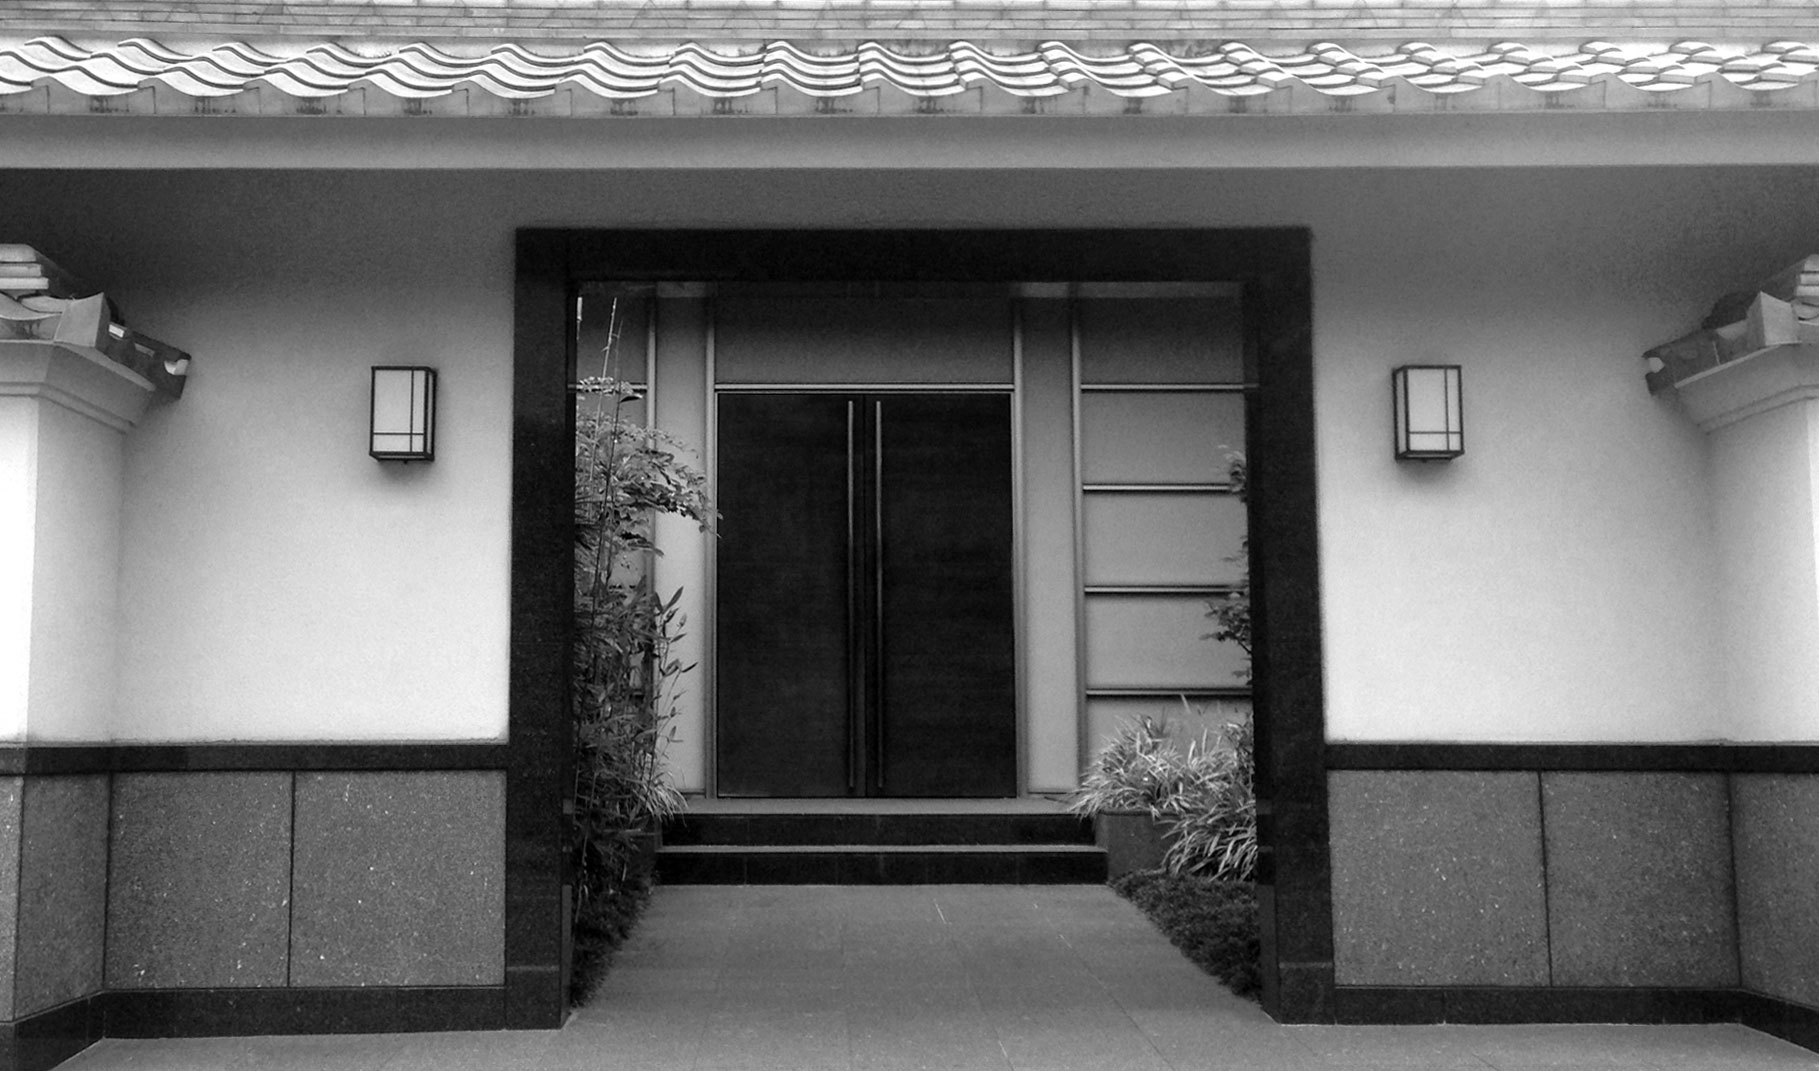 富山、水橋、滑川 瓦の点検・修理は塩原瓦工事店へ